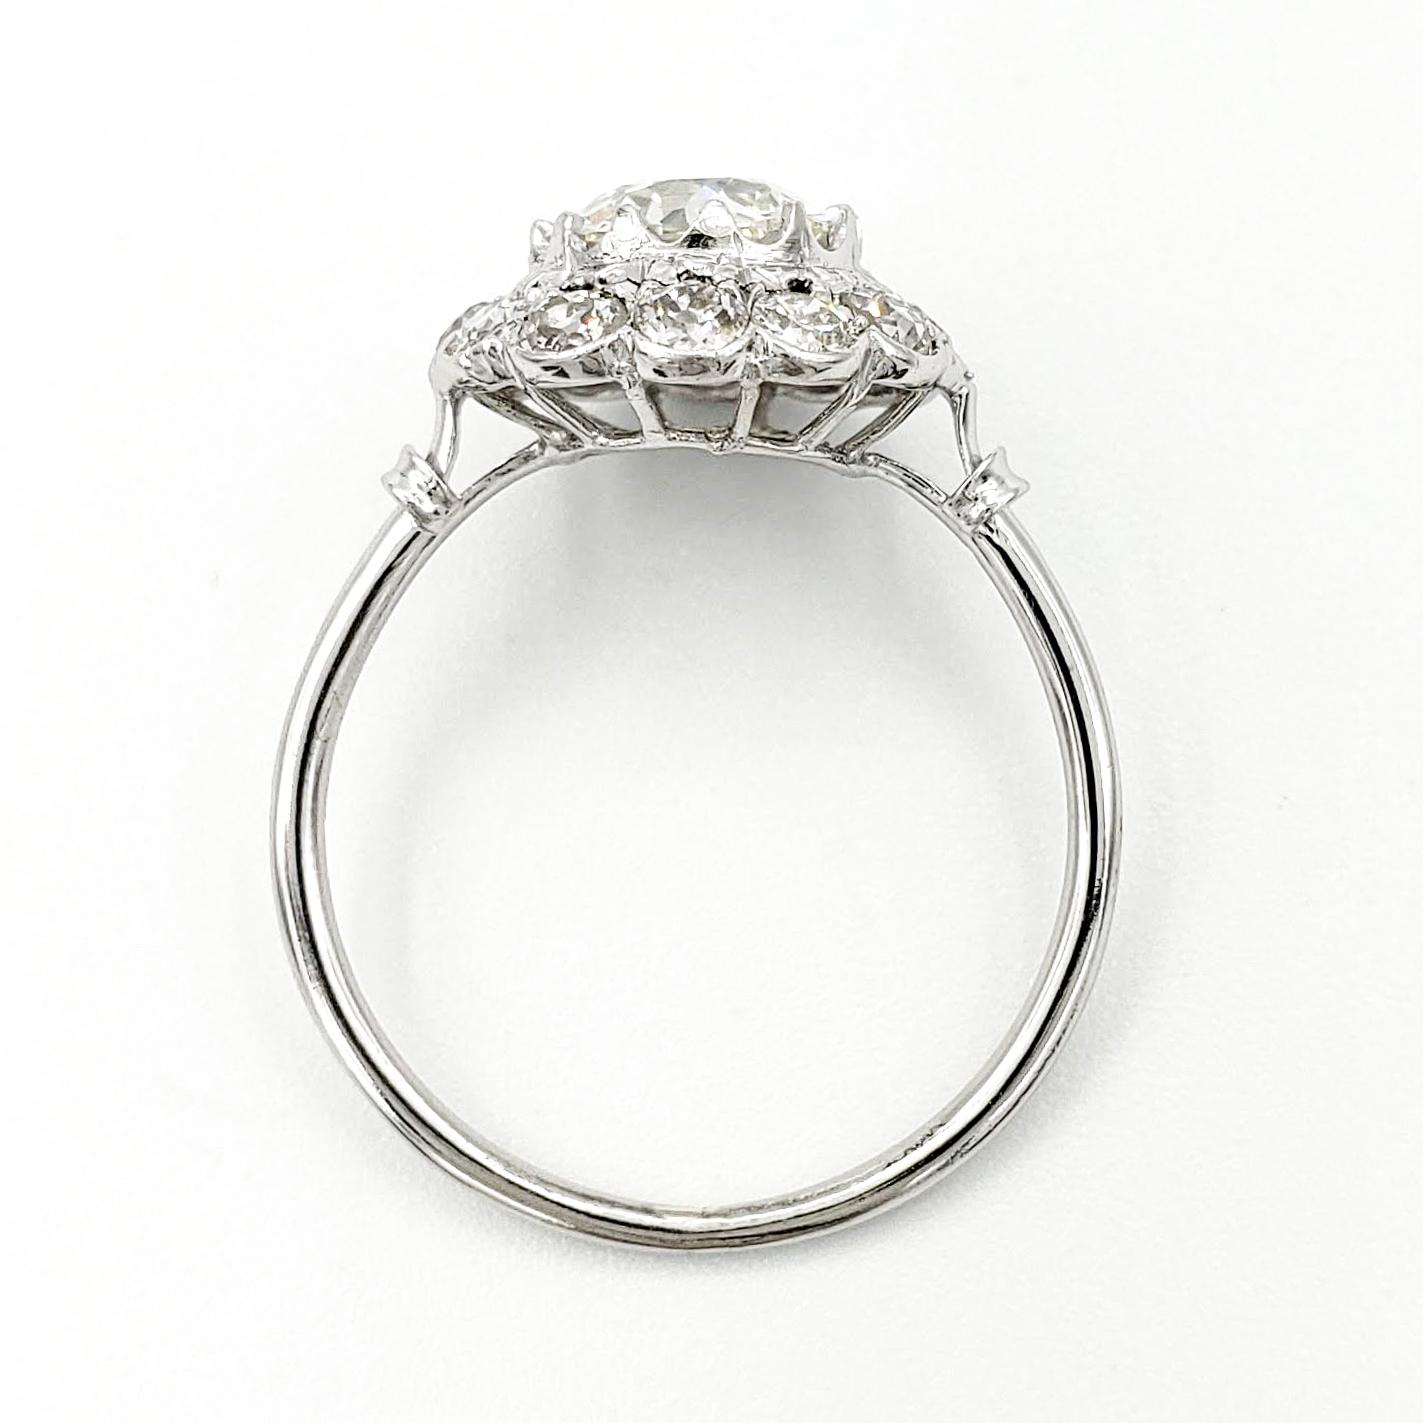 vintage-platinum-engagement-ring-with-1-09-carat-old-european-cut-diamond-egl-h-vs2